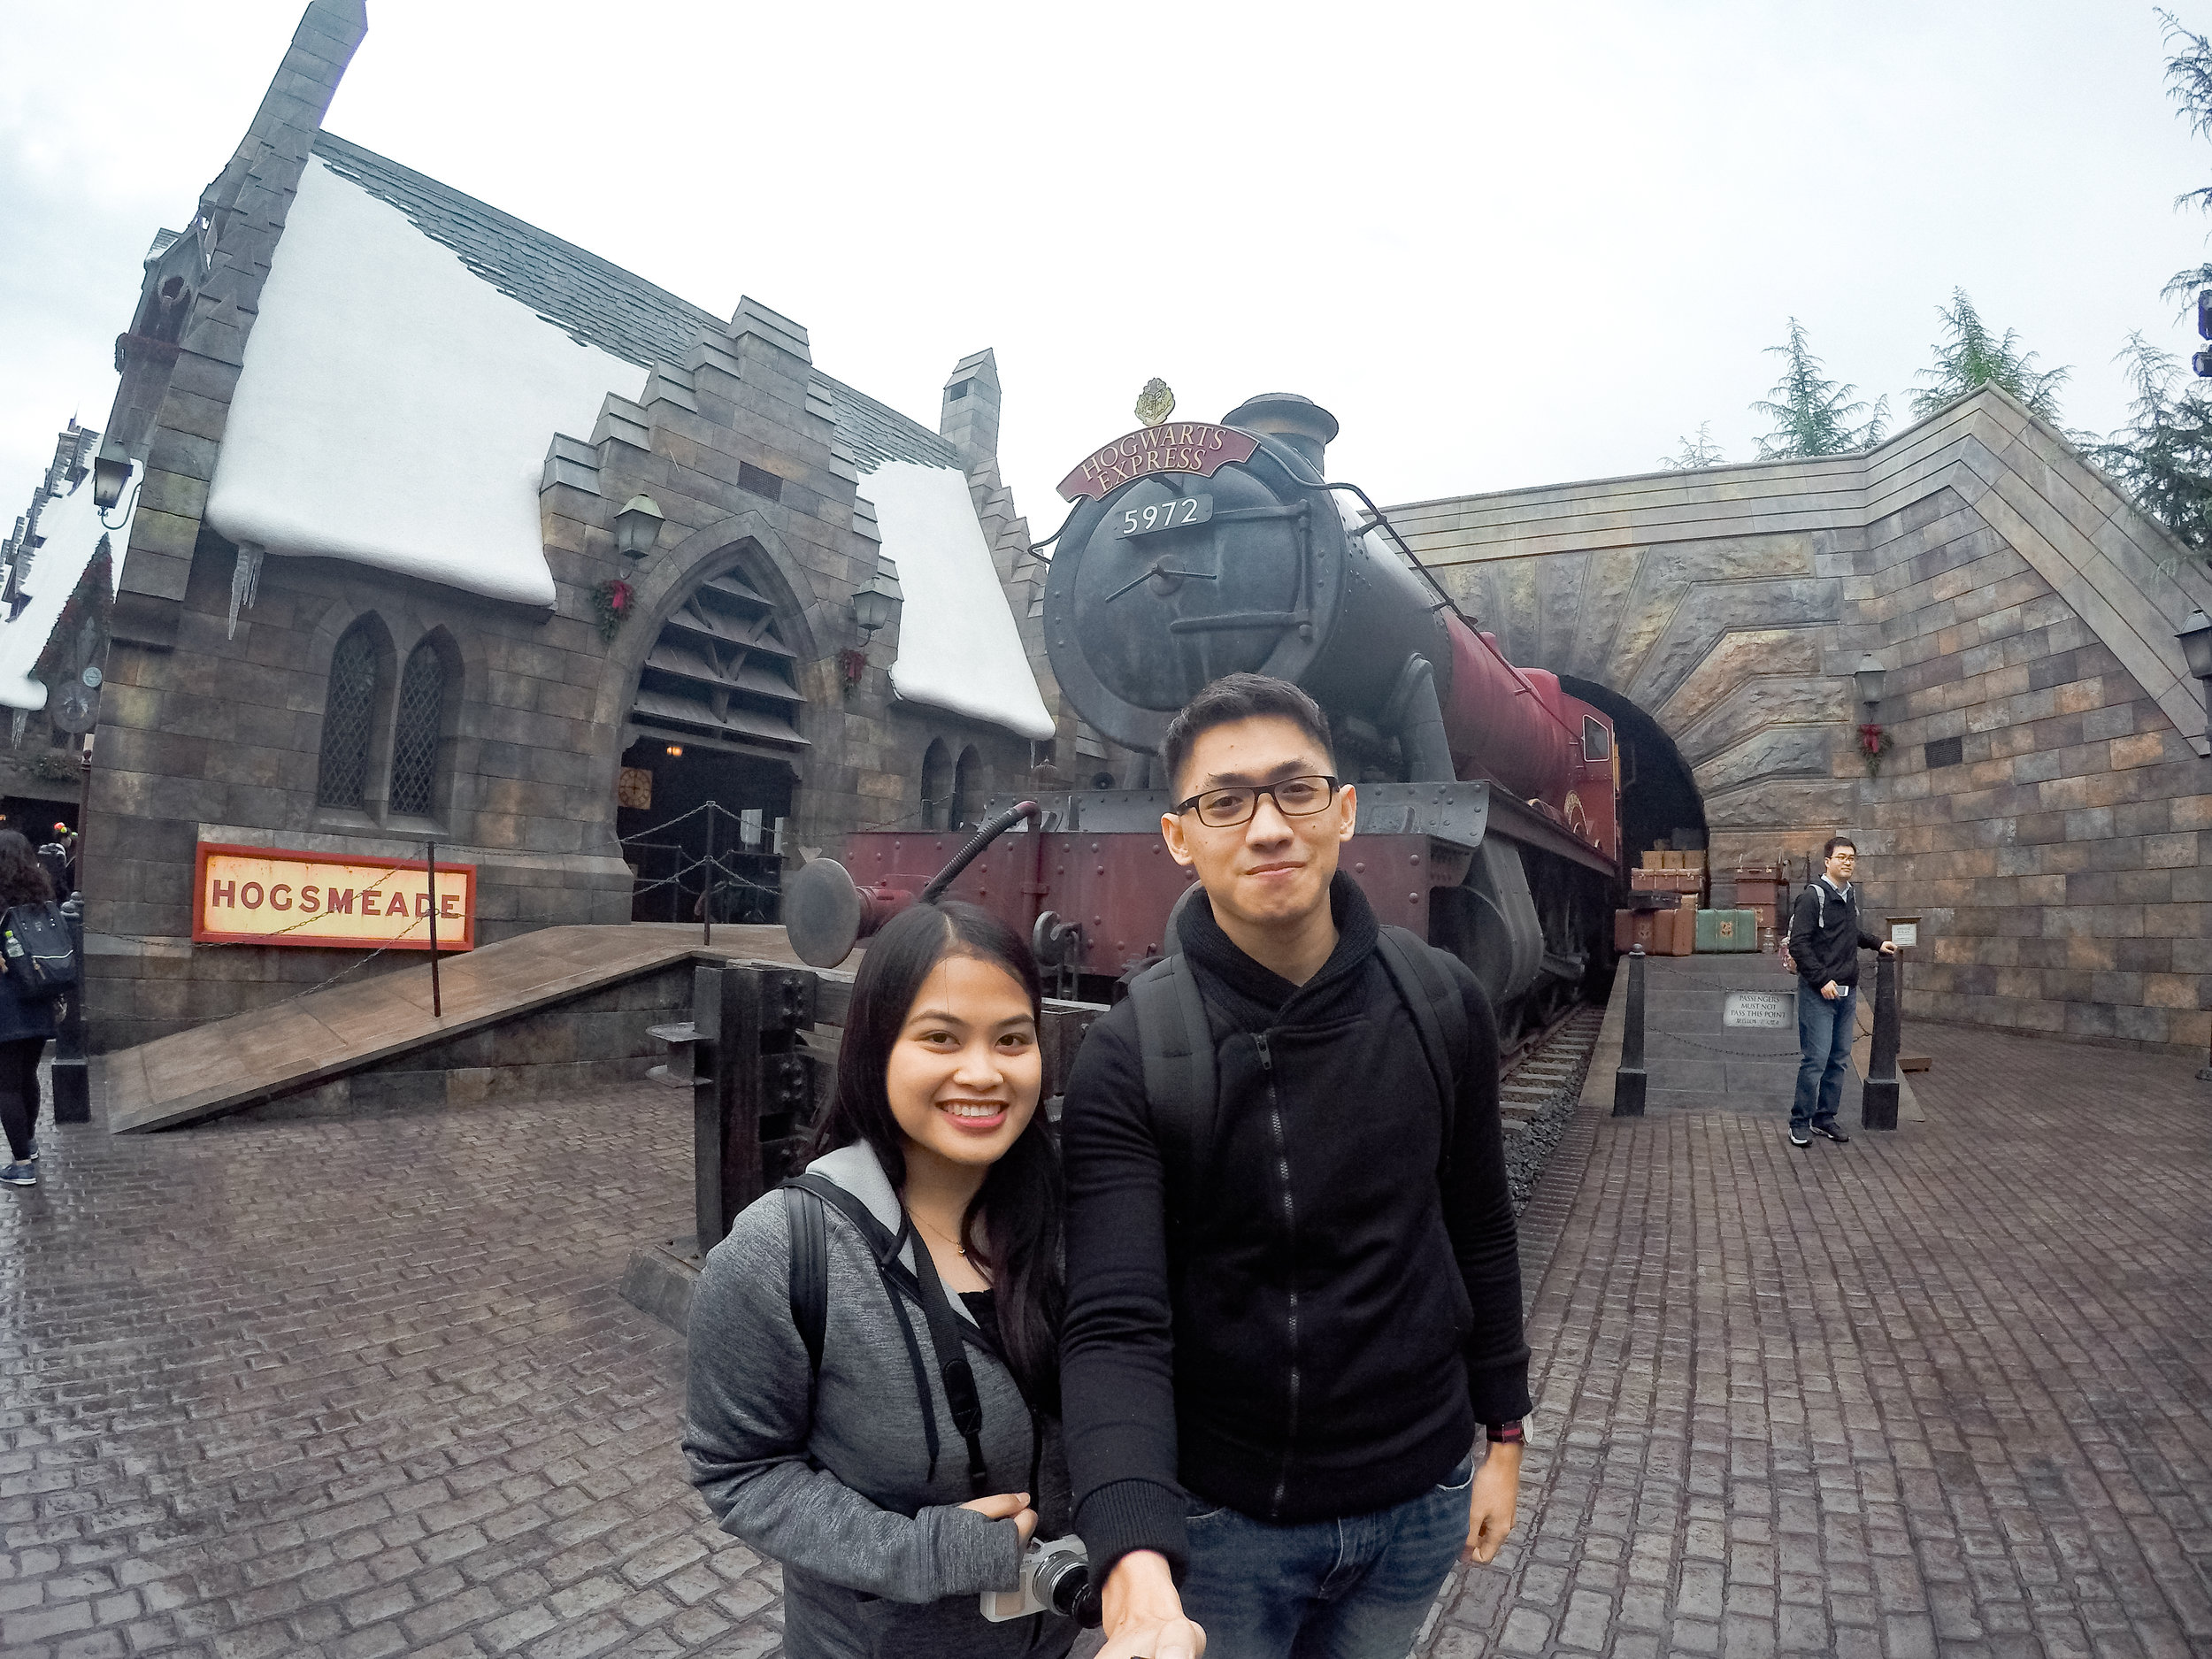 Hogwarts Express! I hope this train can really take me to Hogwarts!